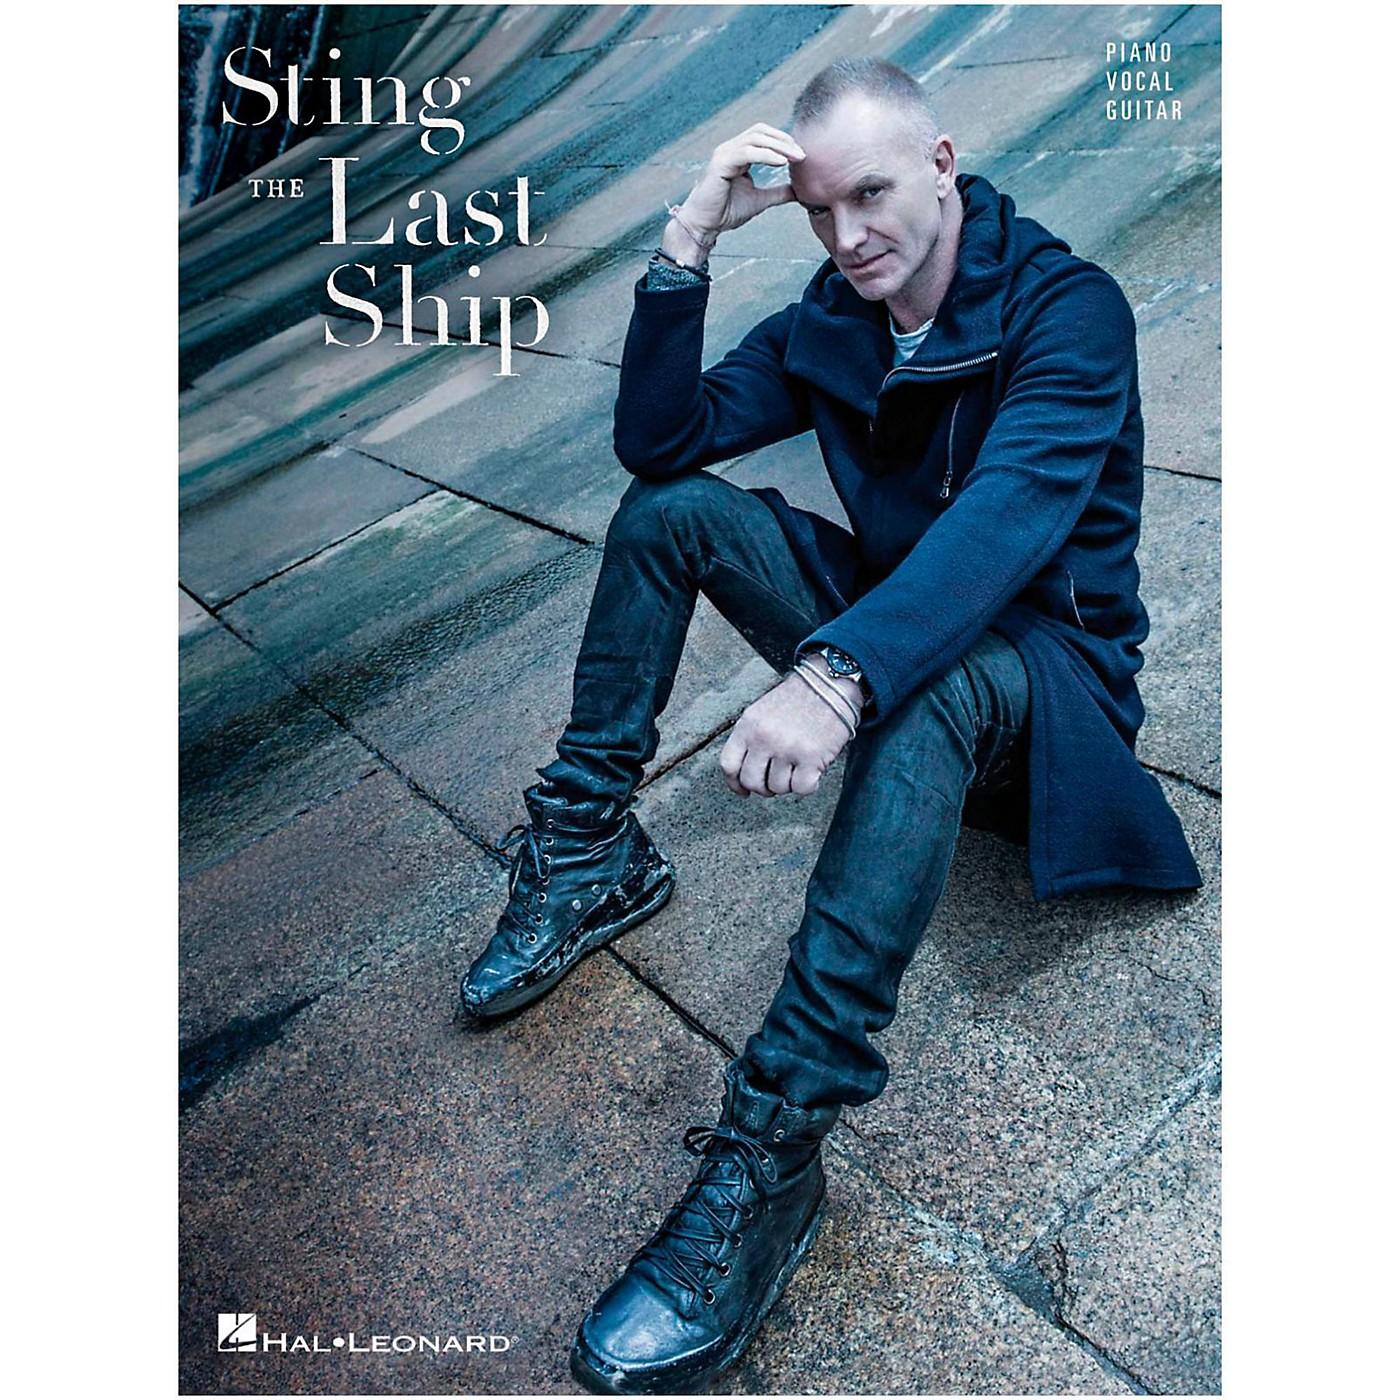 Hal Leonard Sting - The Last Ship fpr Piano/Vocal/Guitar thumbnail